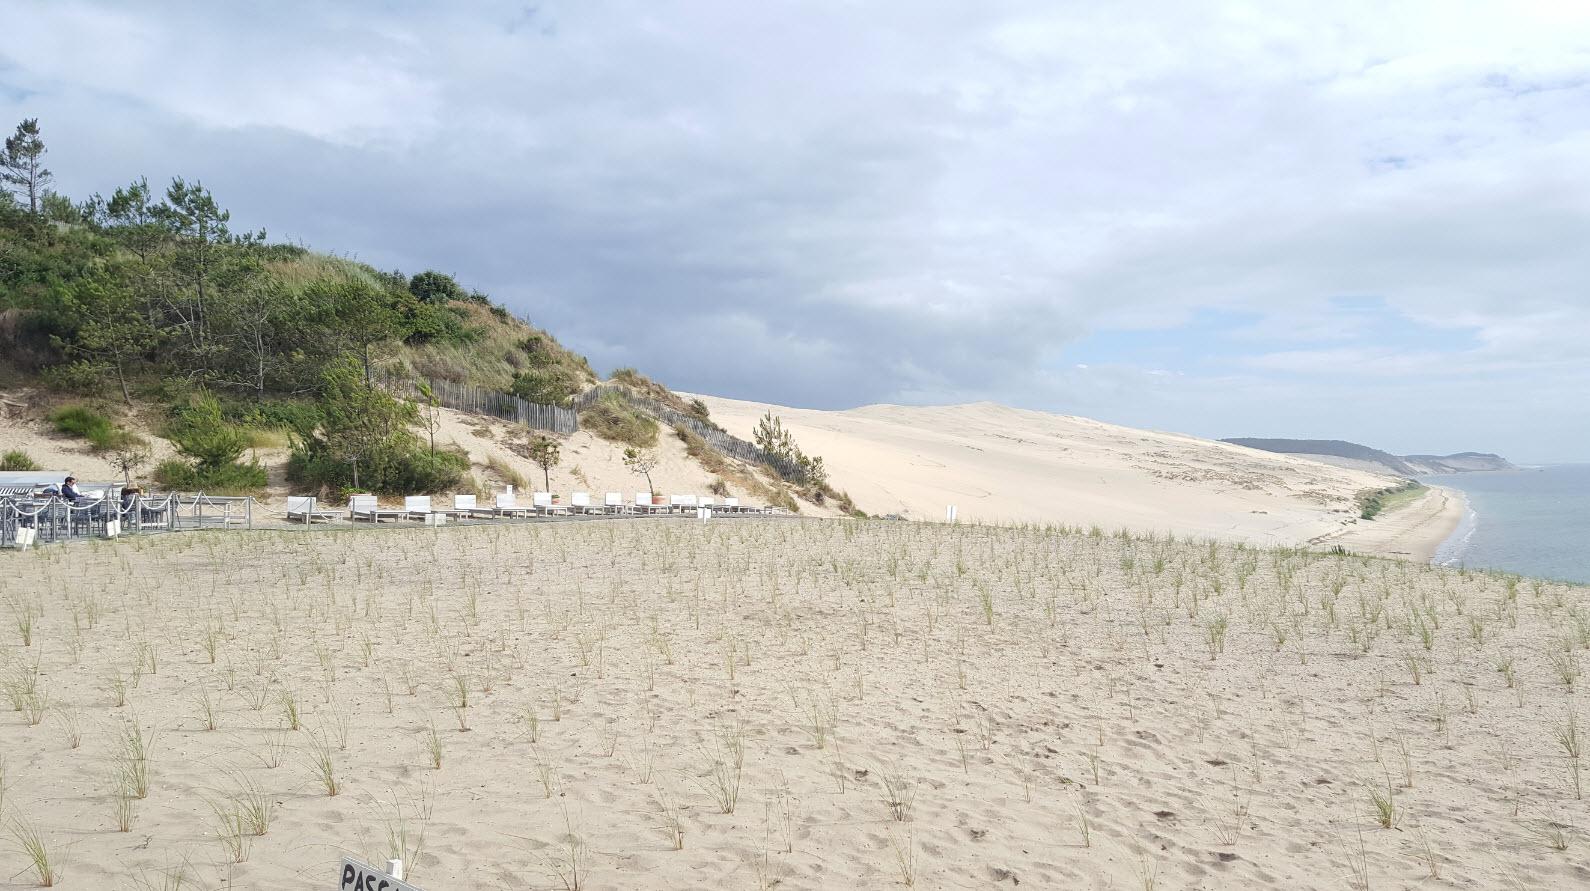 Dune vue de cote